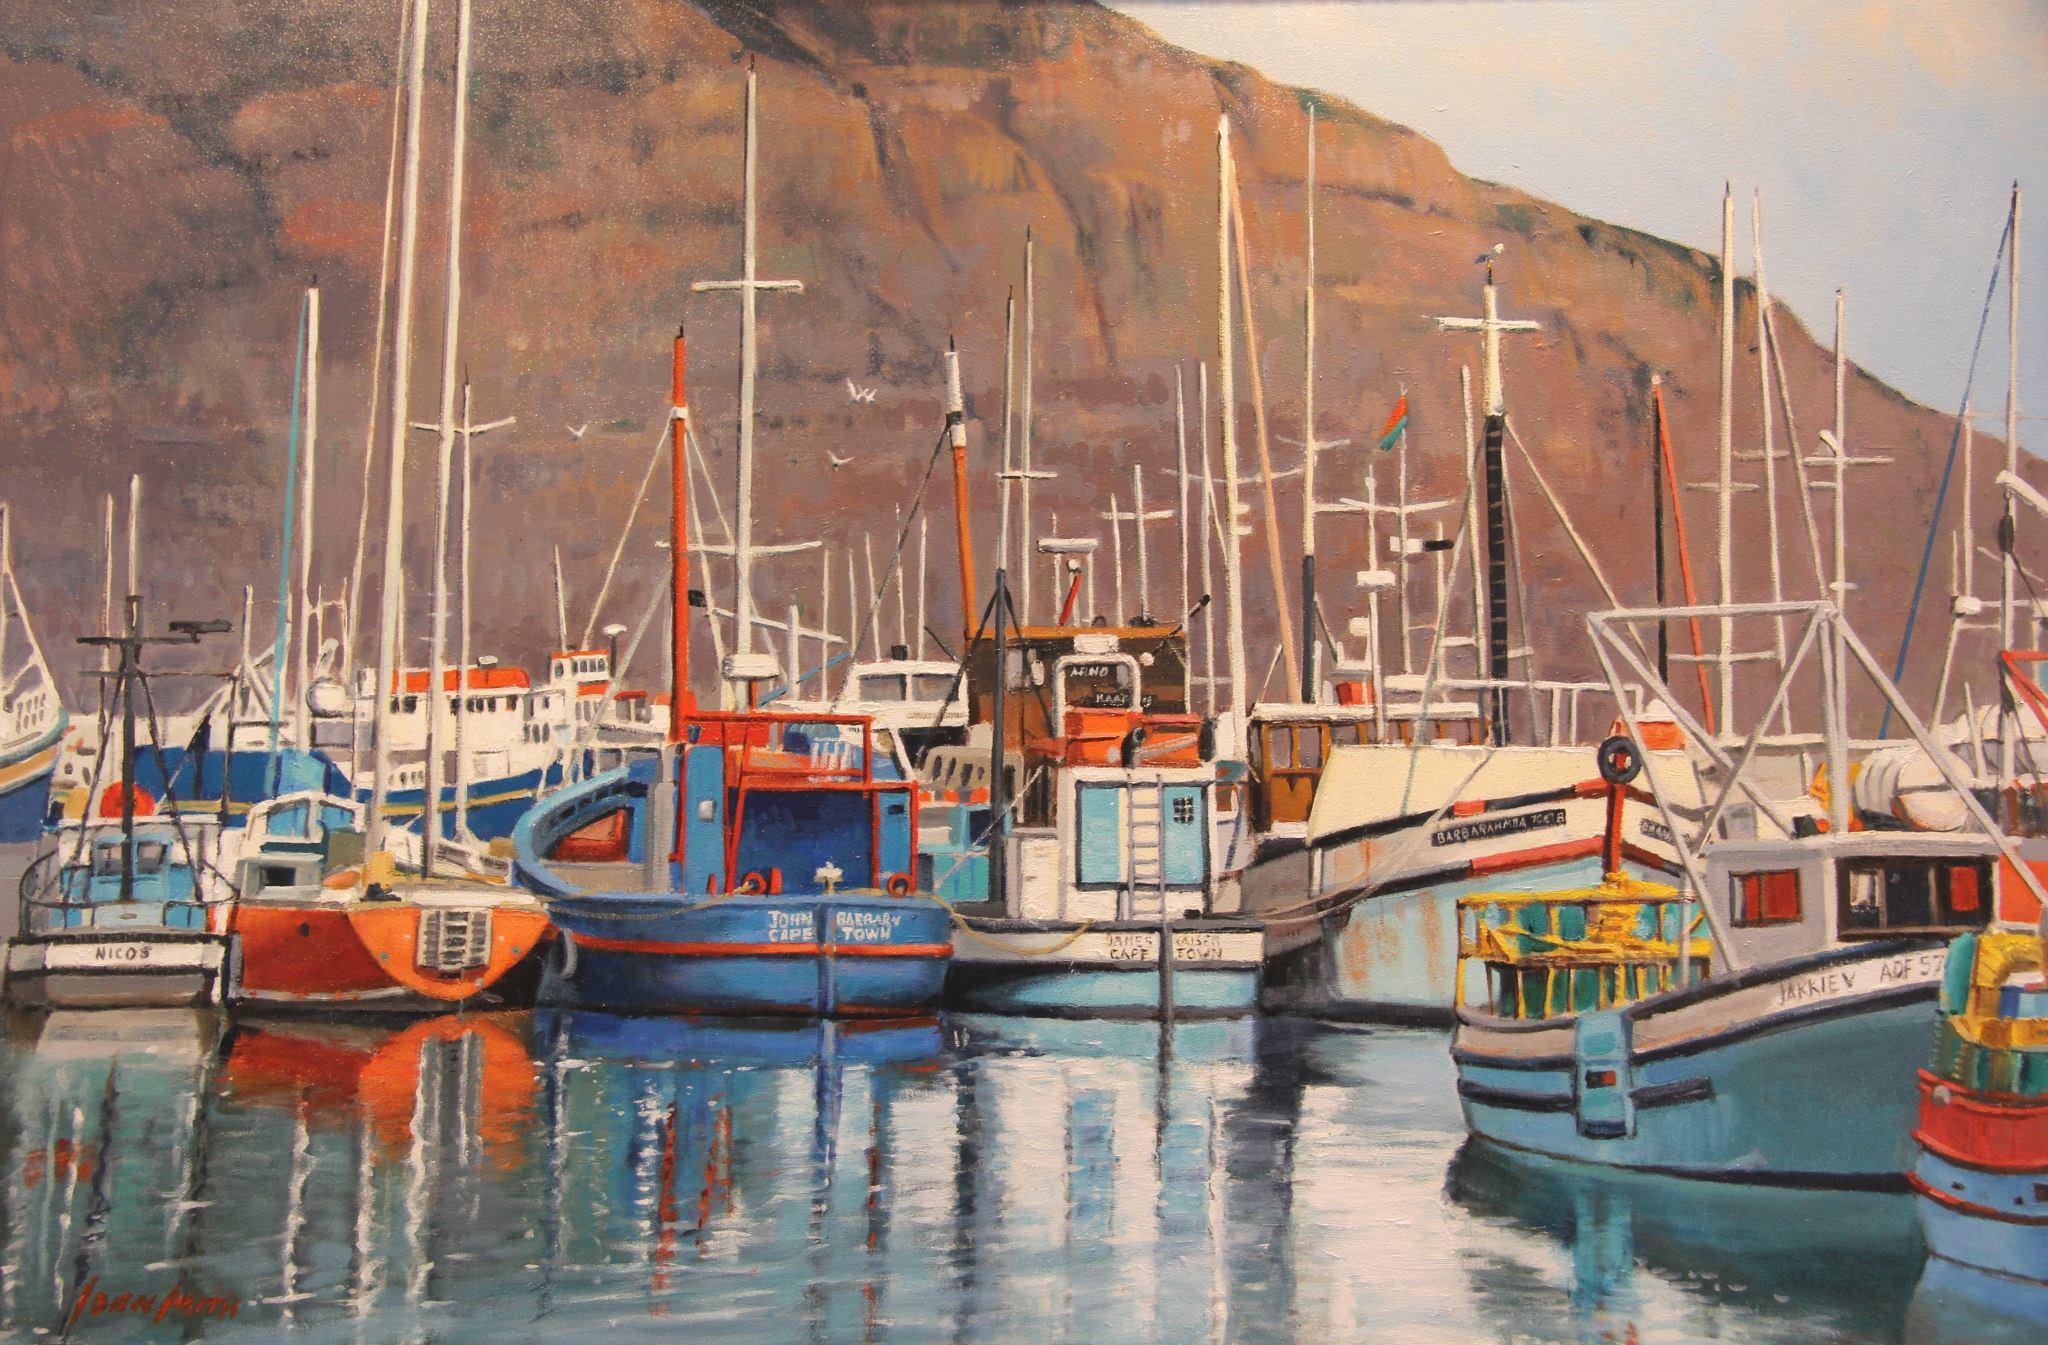 'Trawlers at Hout Bay'